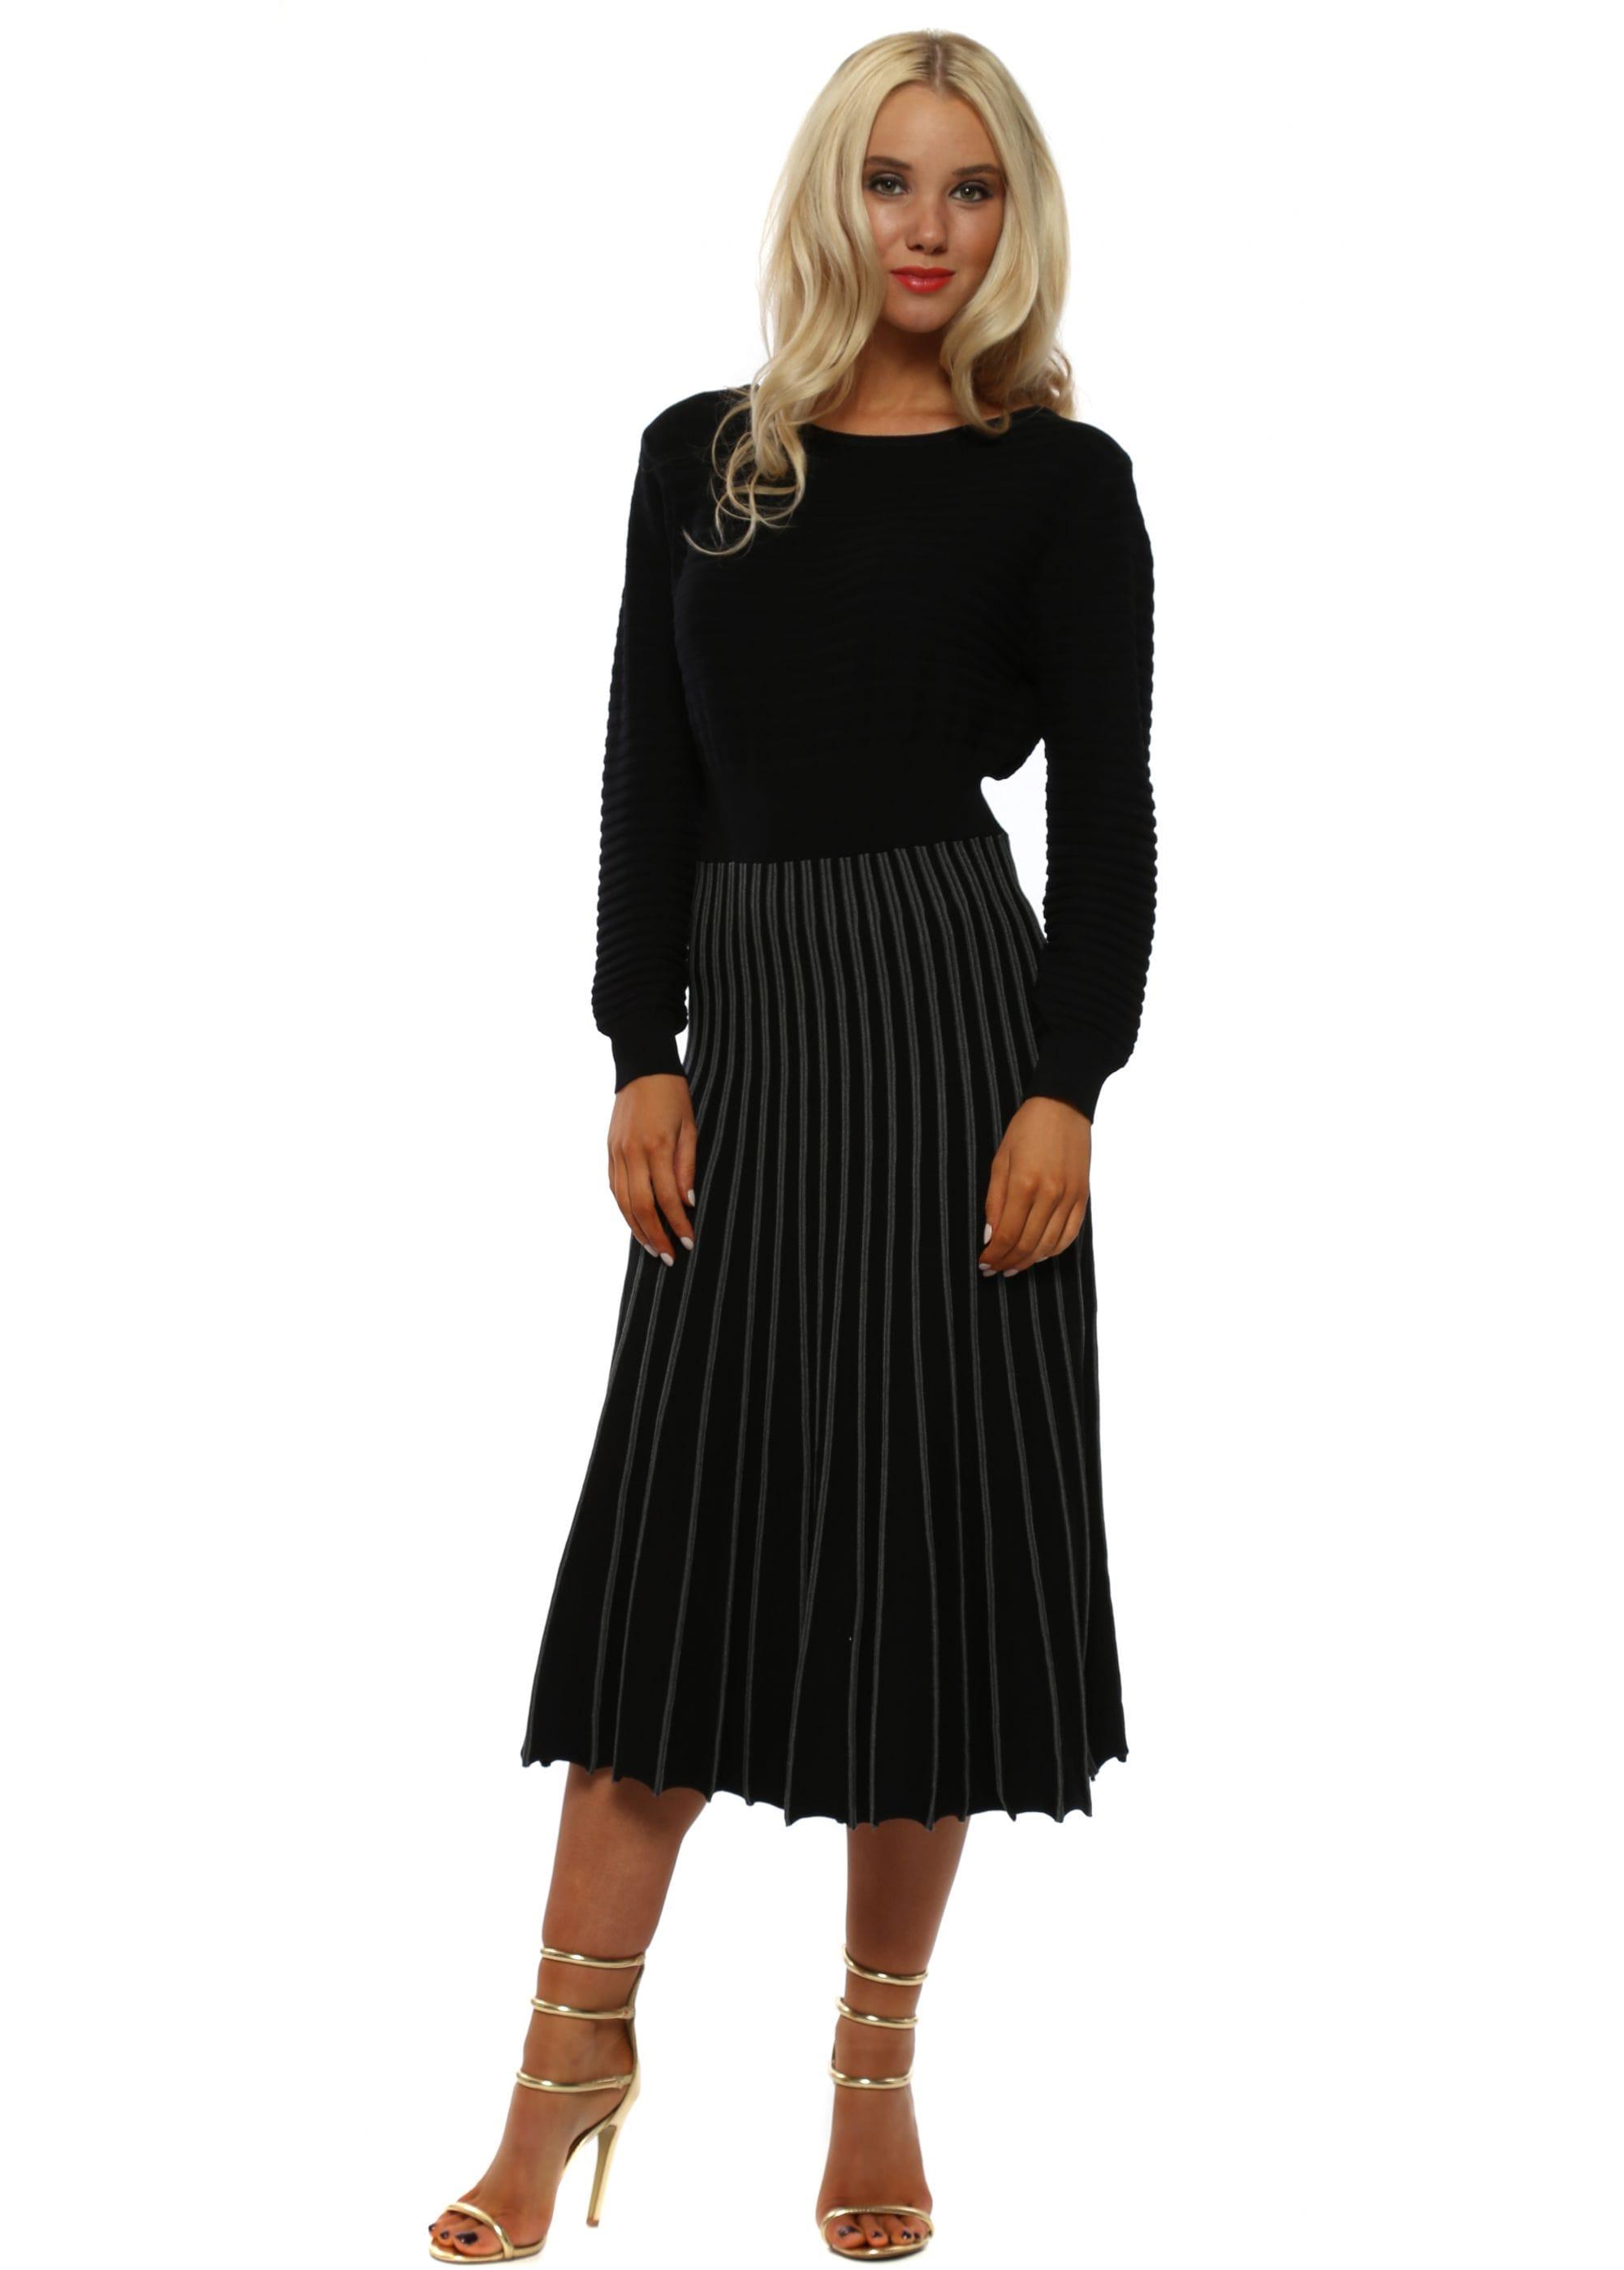 743b9ea08dafb0 Black Ribbed Fine Knit Midi Dress by Laetitia Mem